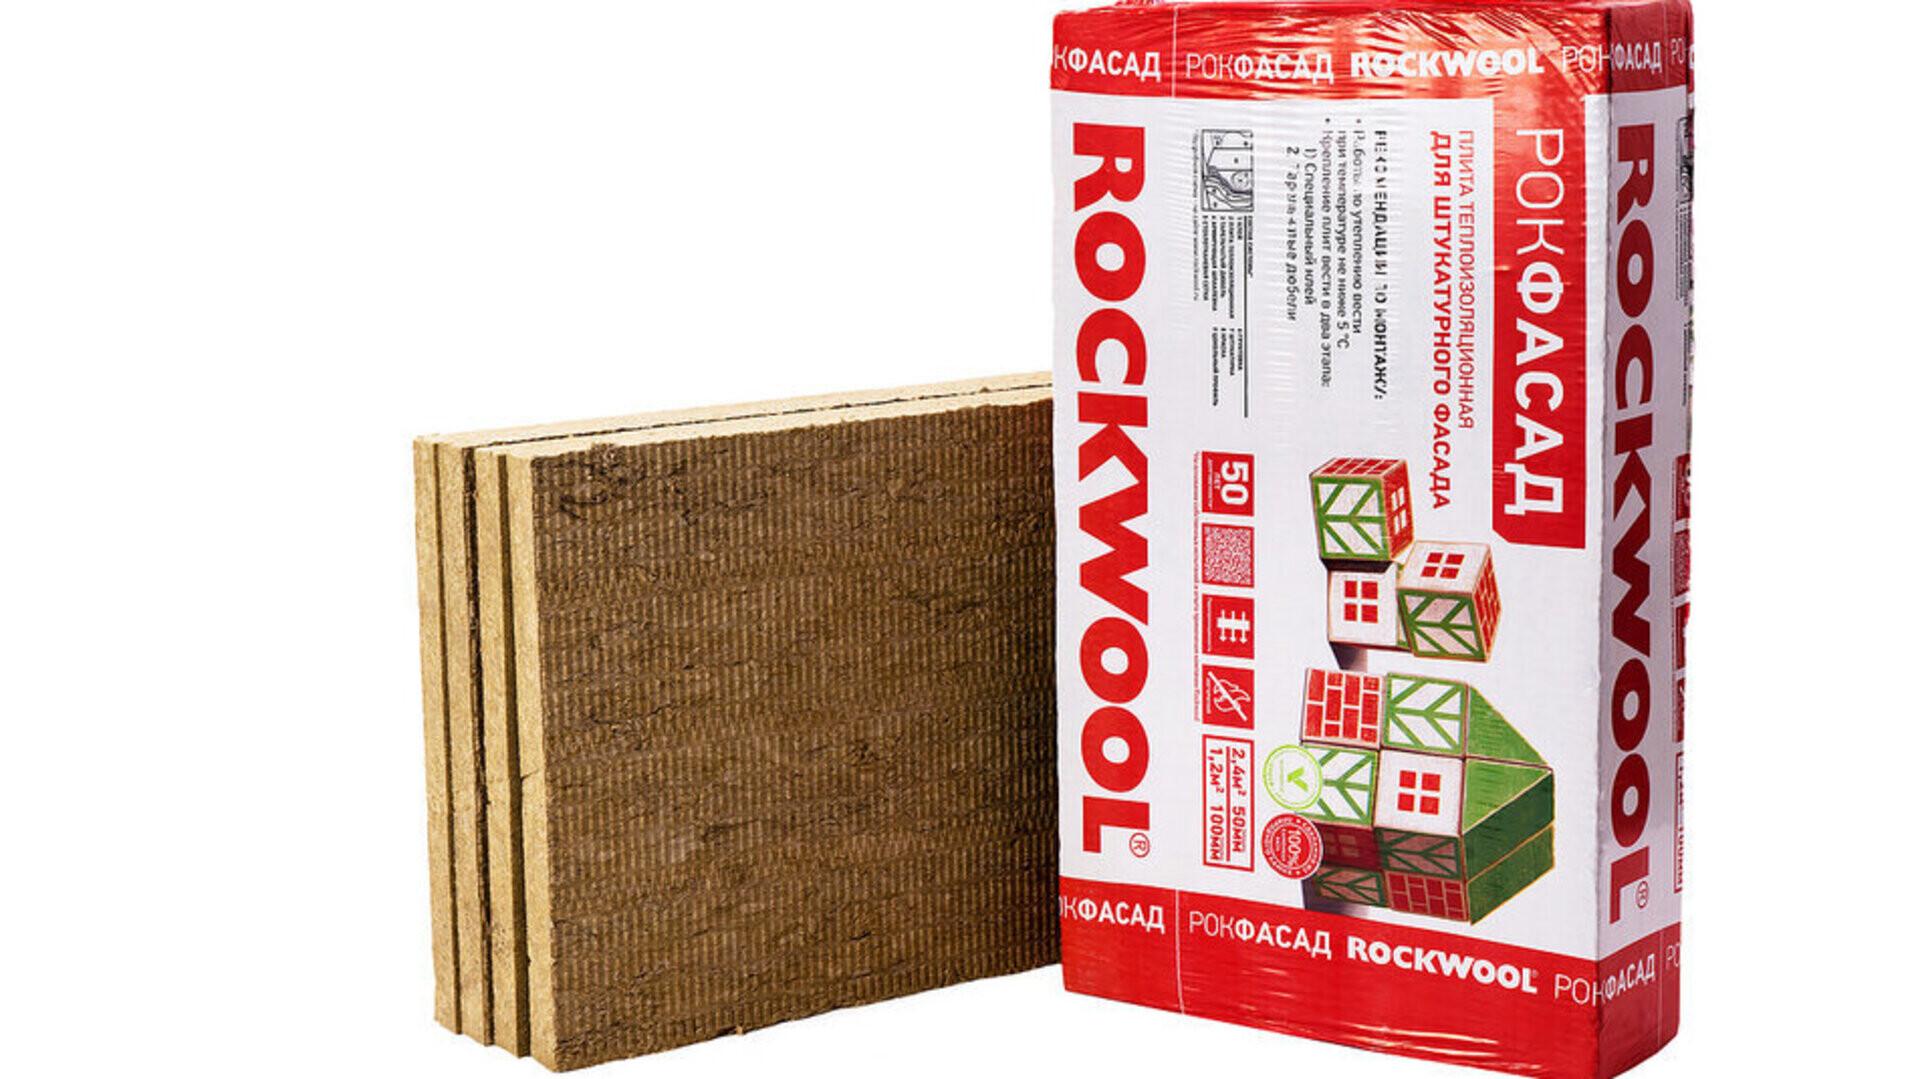 ROCKFACADE, package, product, slabs, HVAC, Process industry, Rockfacade, Rendered facades